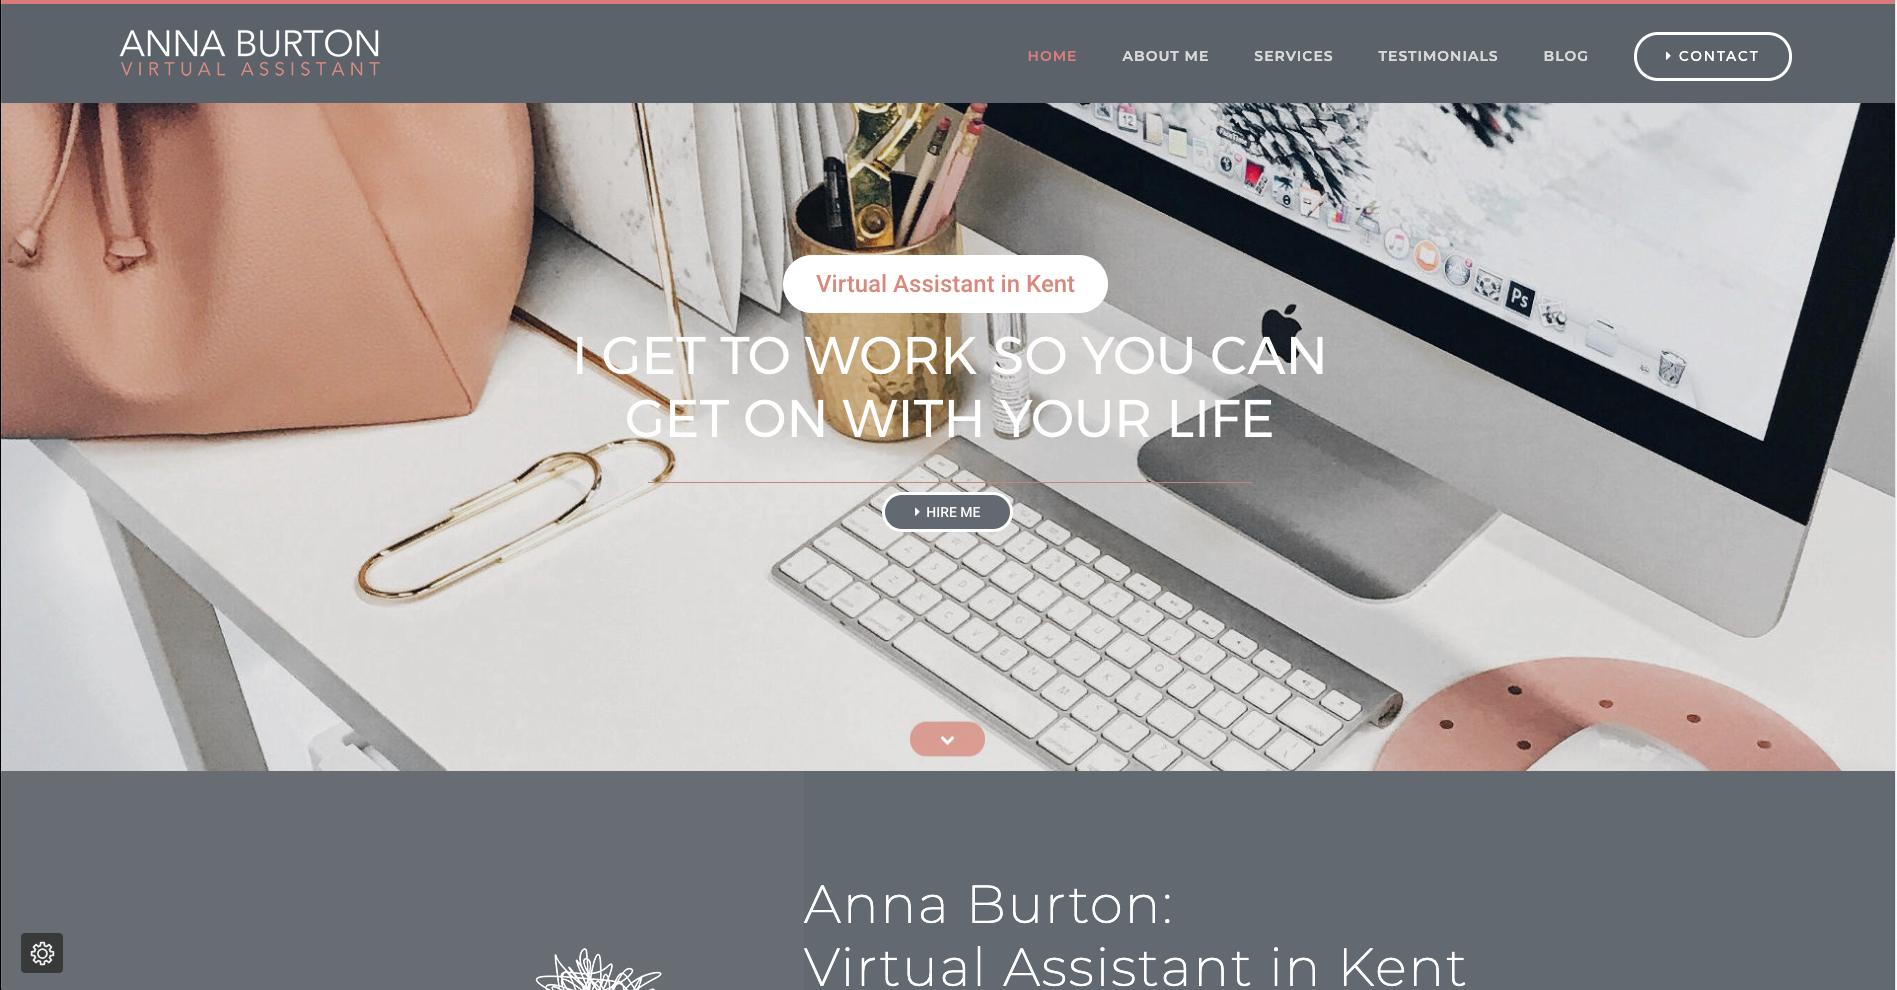 anna burton virtual assistant homepage